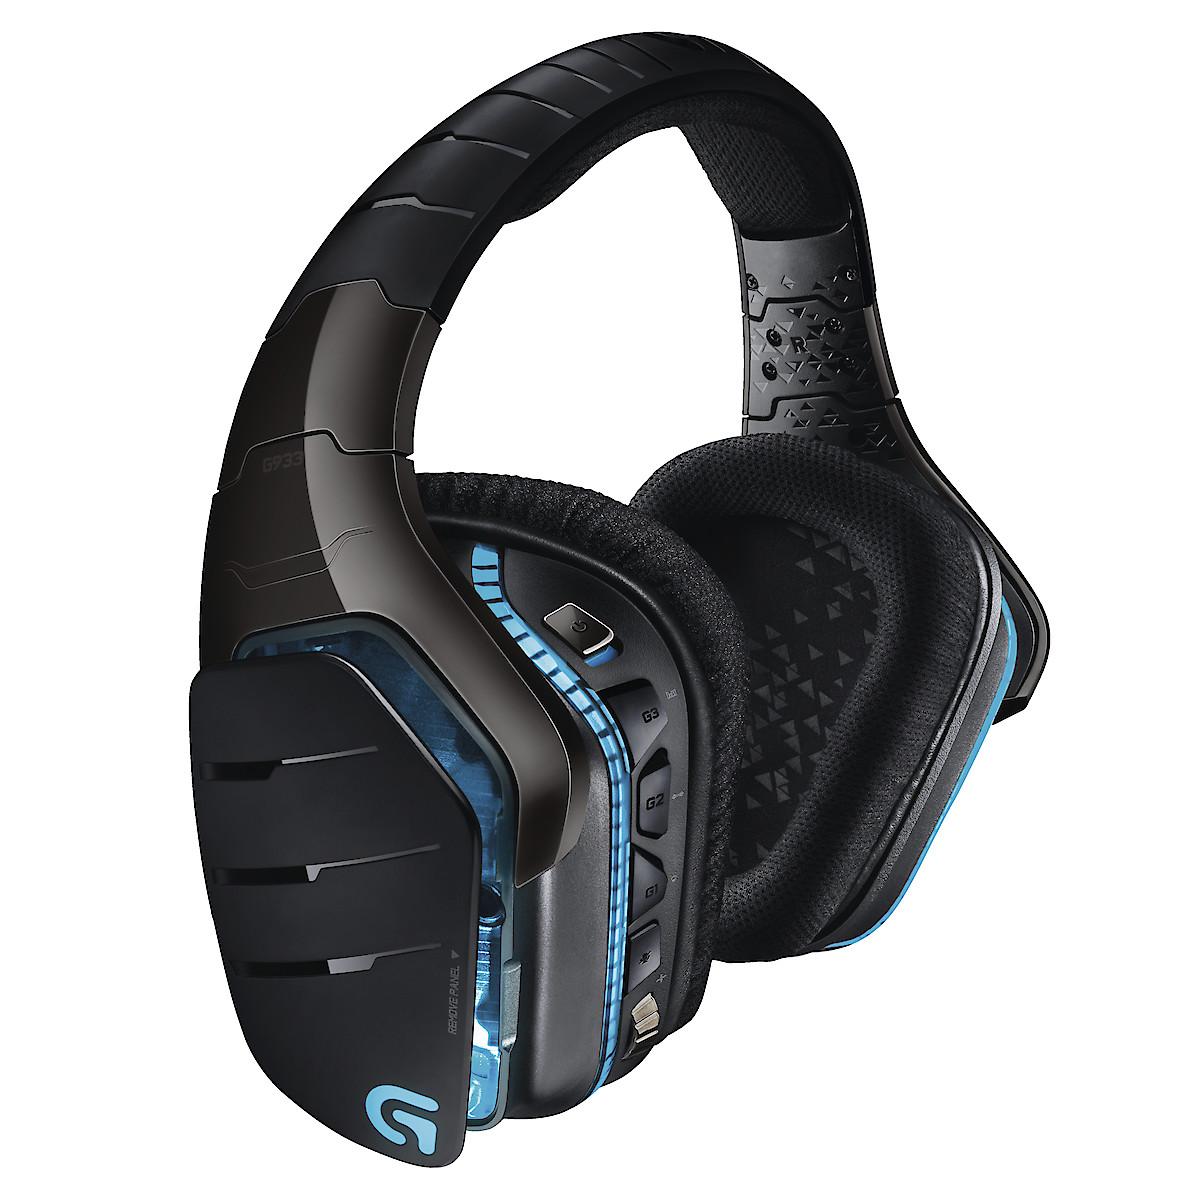 Logitech G933 Artemis Spectrum trådløst gaming headset